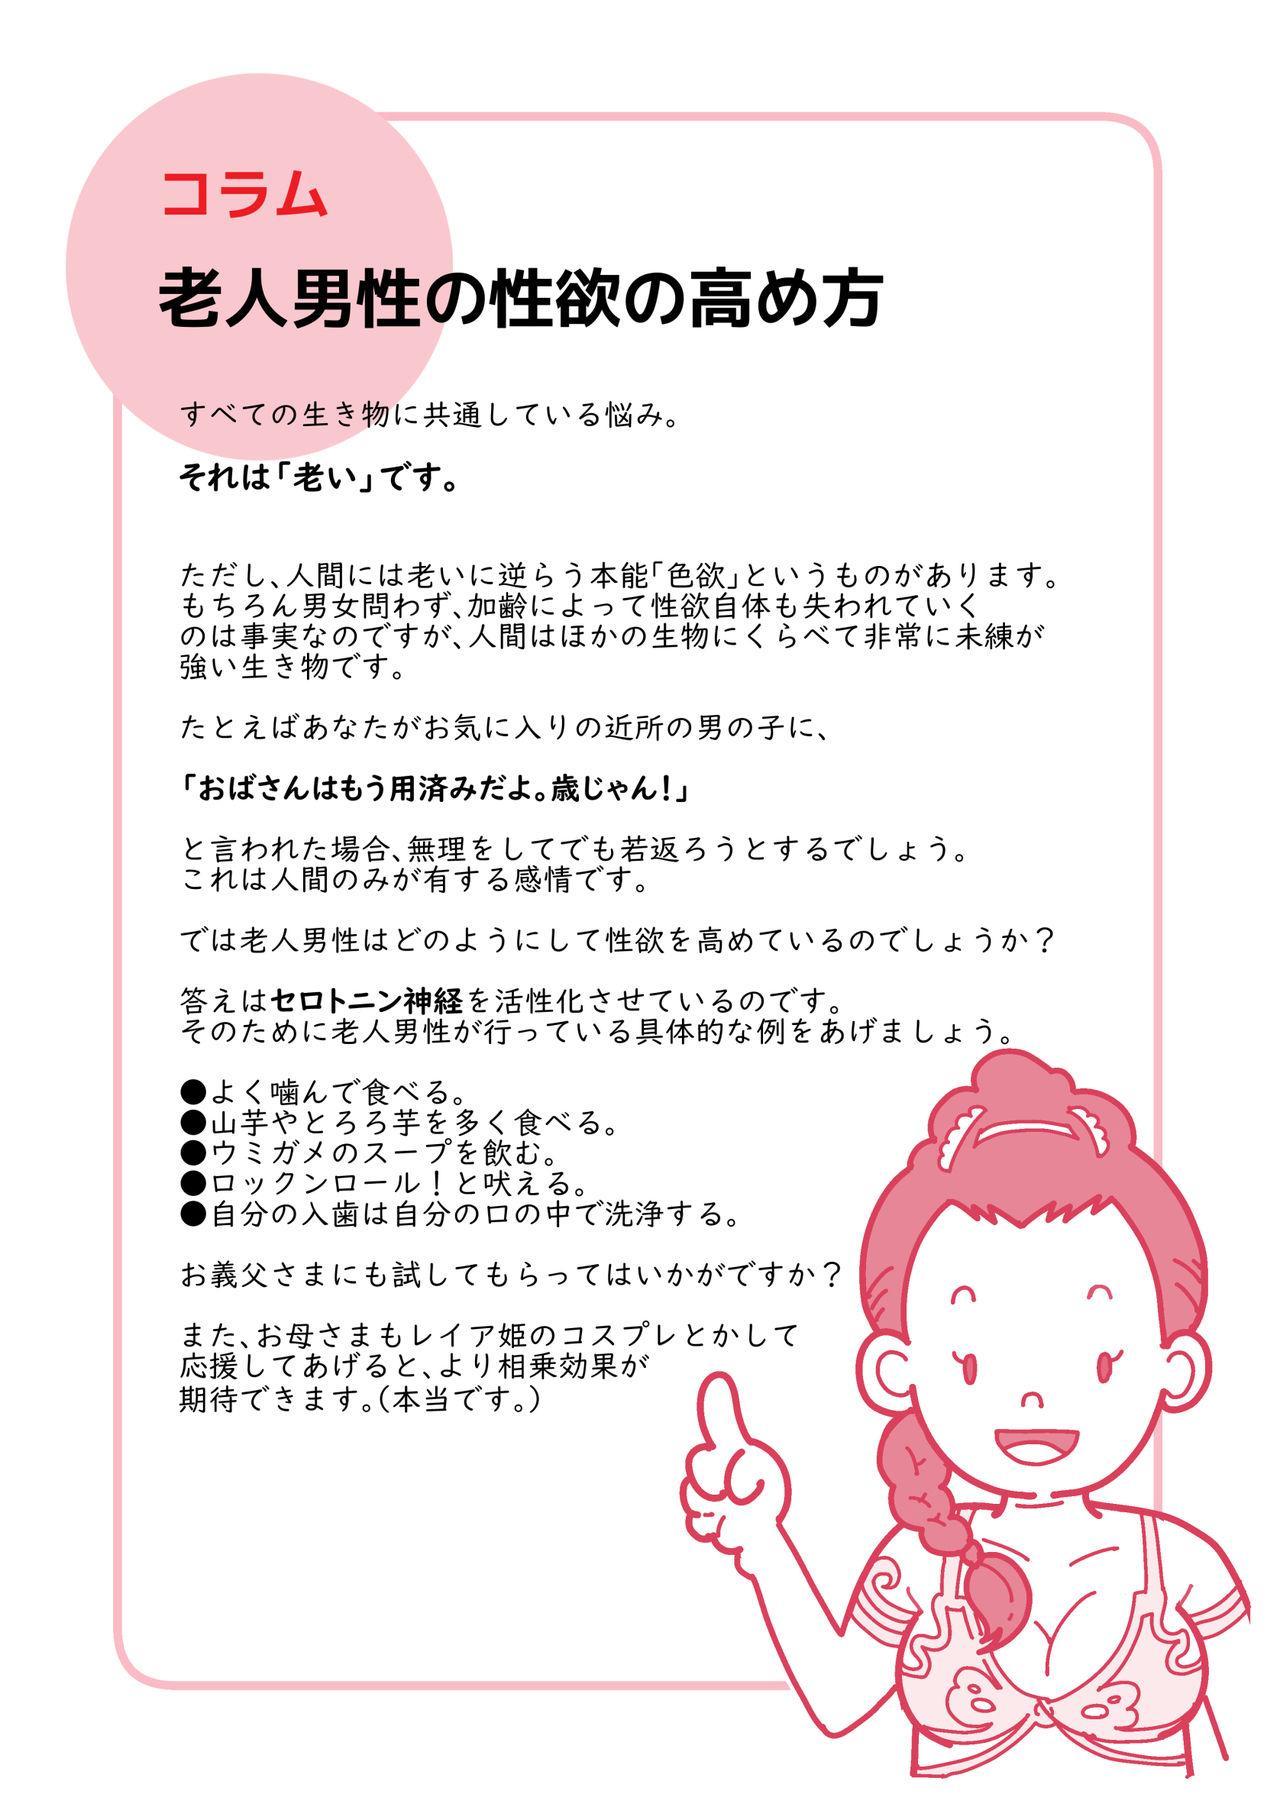 Isogasii Okaasan No Tamuno Sasa Rouzin Seikaigo | Guide for Elderly Sex Health Care to Busy Mom 19